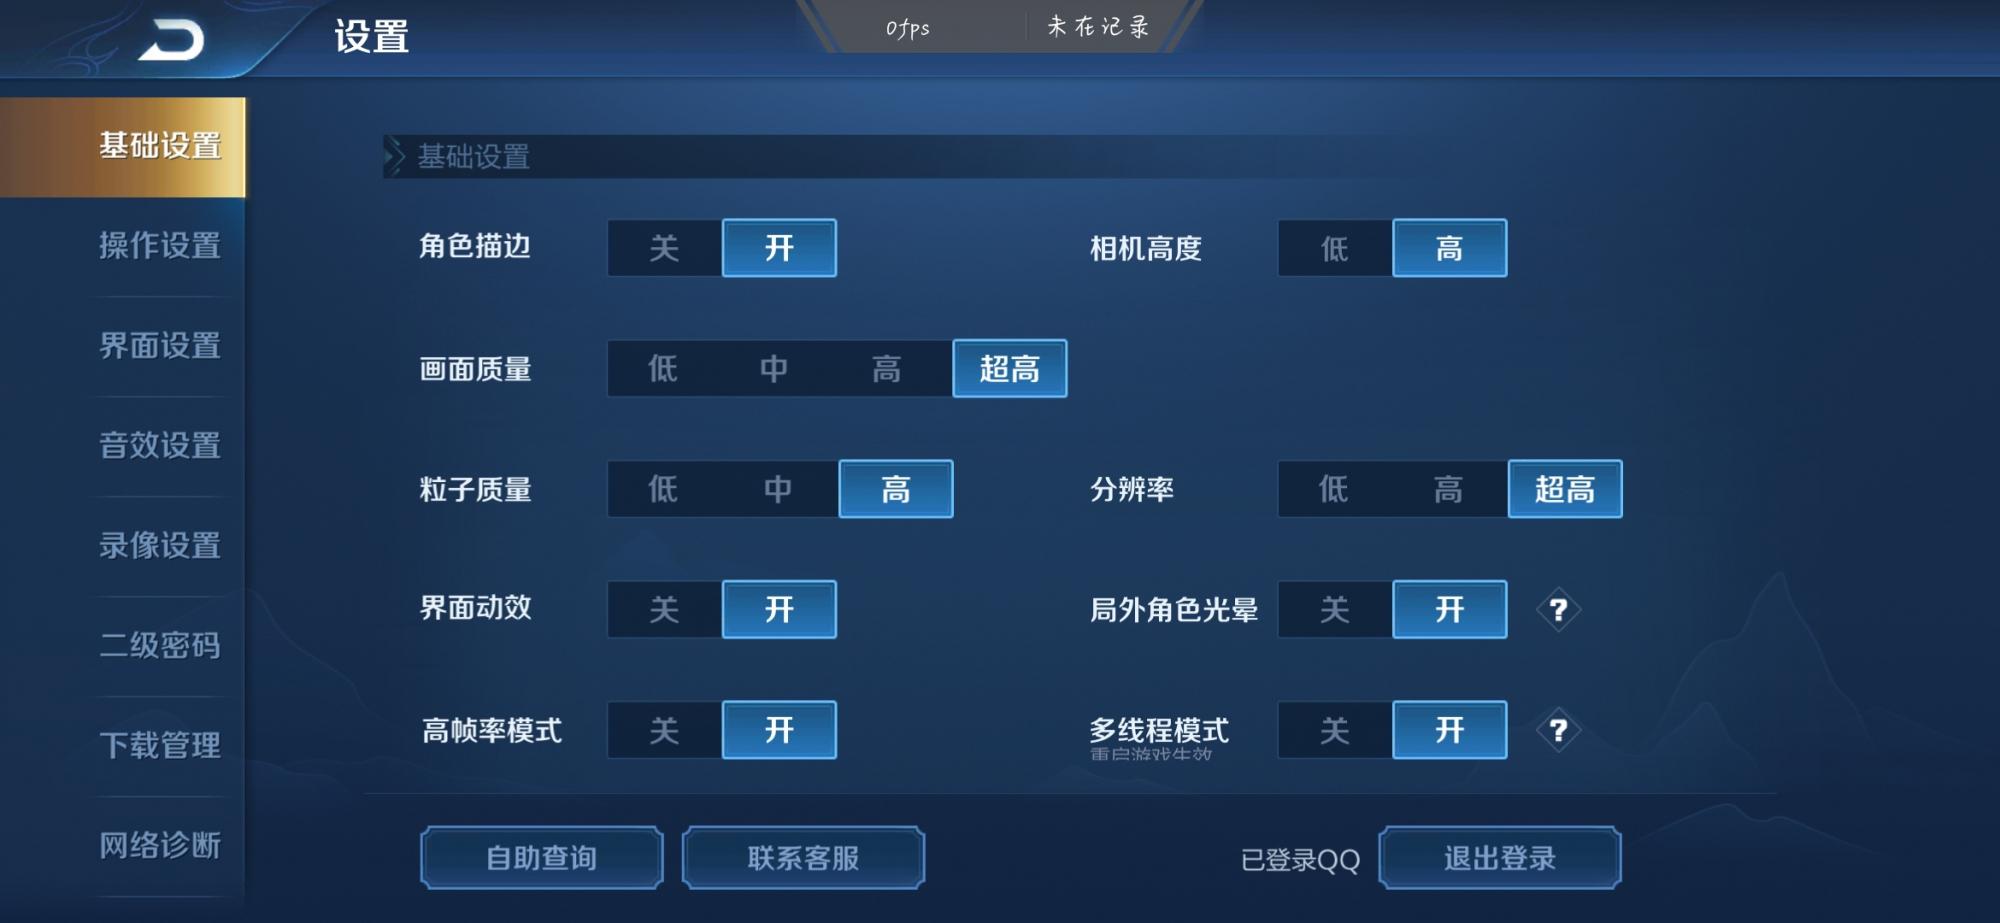 Screenshot_20190530_172635_com.tencent.tmgp.sgame.jpg